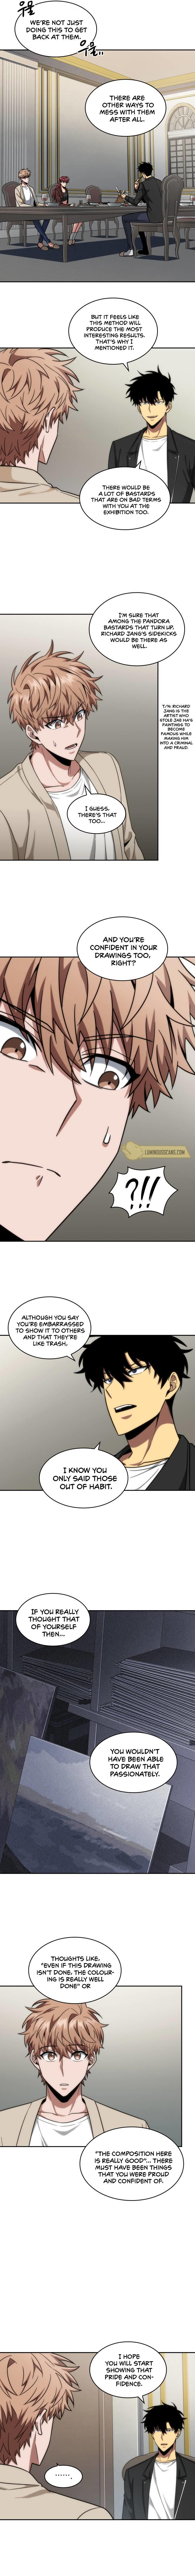 Tomb Raider King Chapter 250 page 10 - Mangakakalot